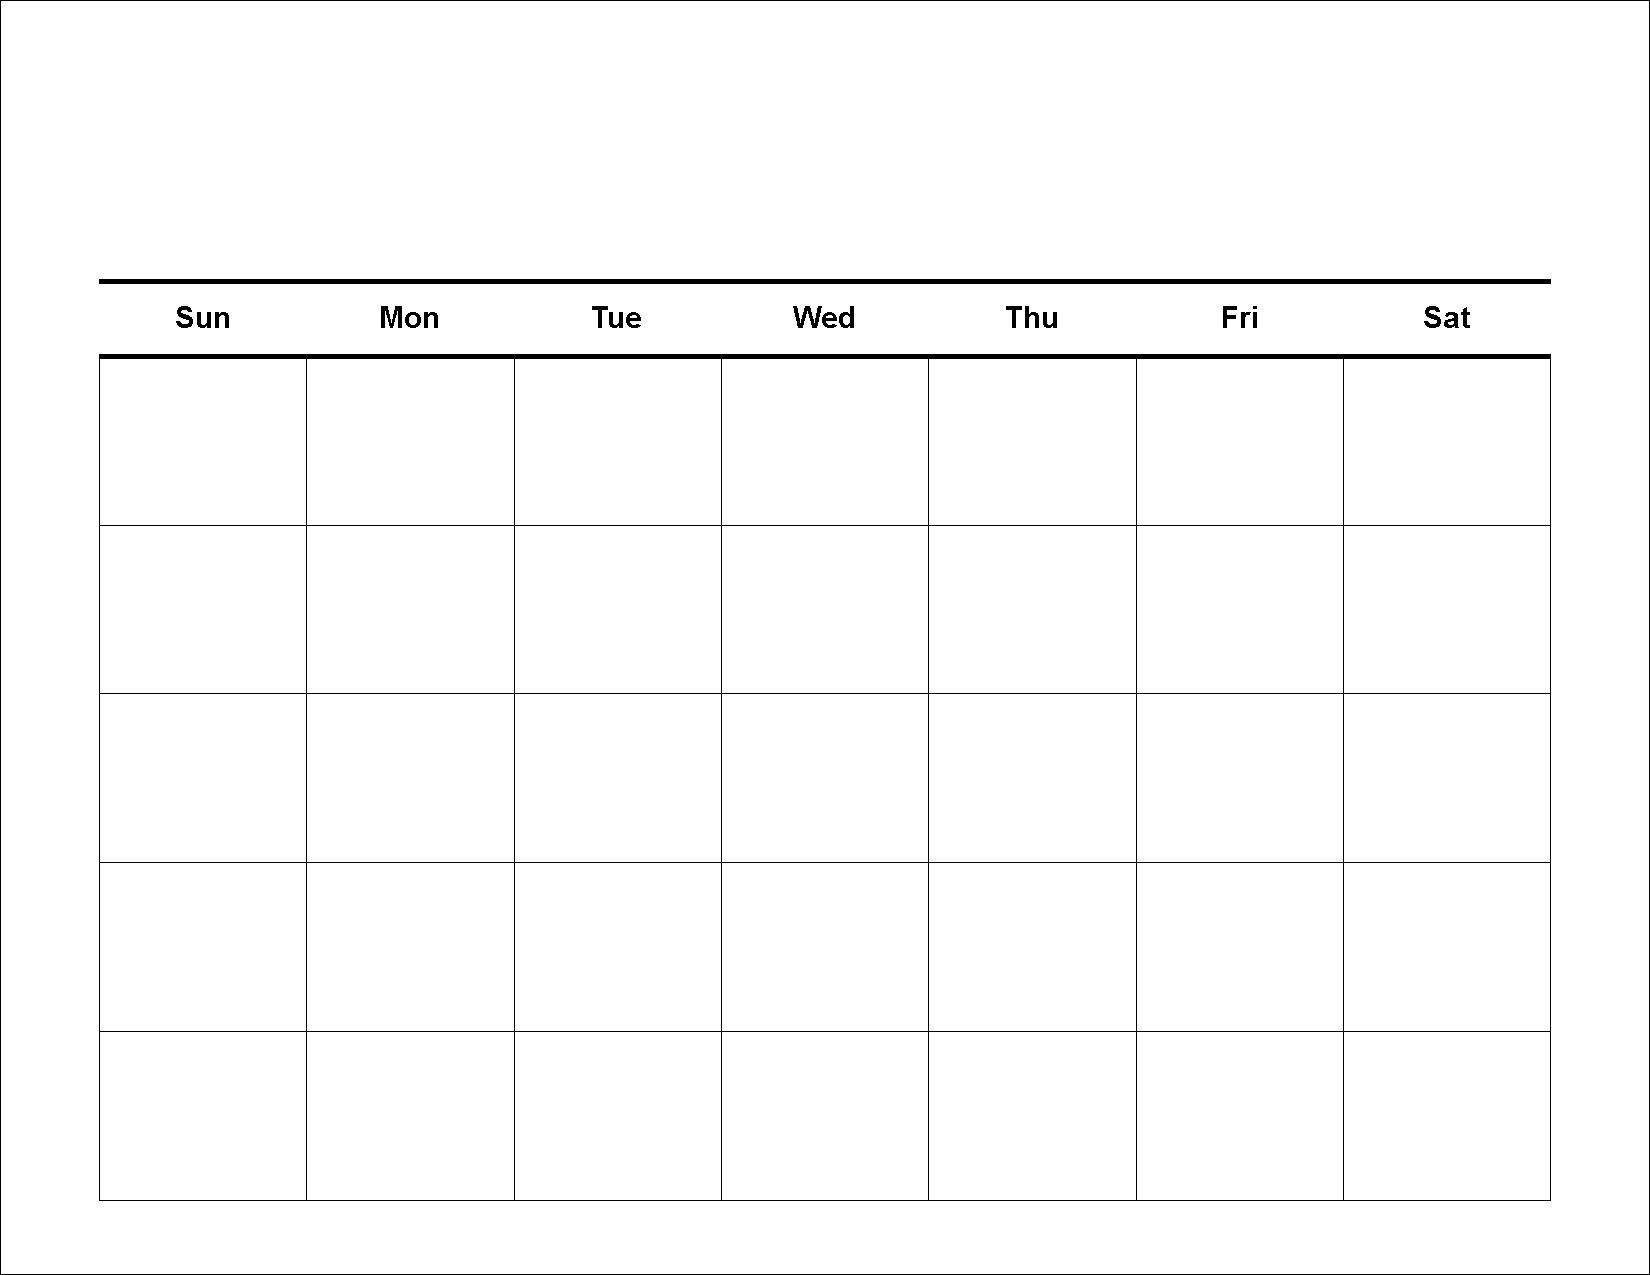 Blank Calendar - Printable 2013 Calendar Templates 4 Week Blank Calender Template